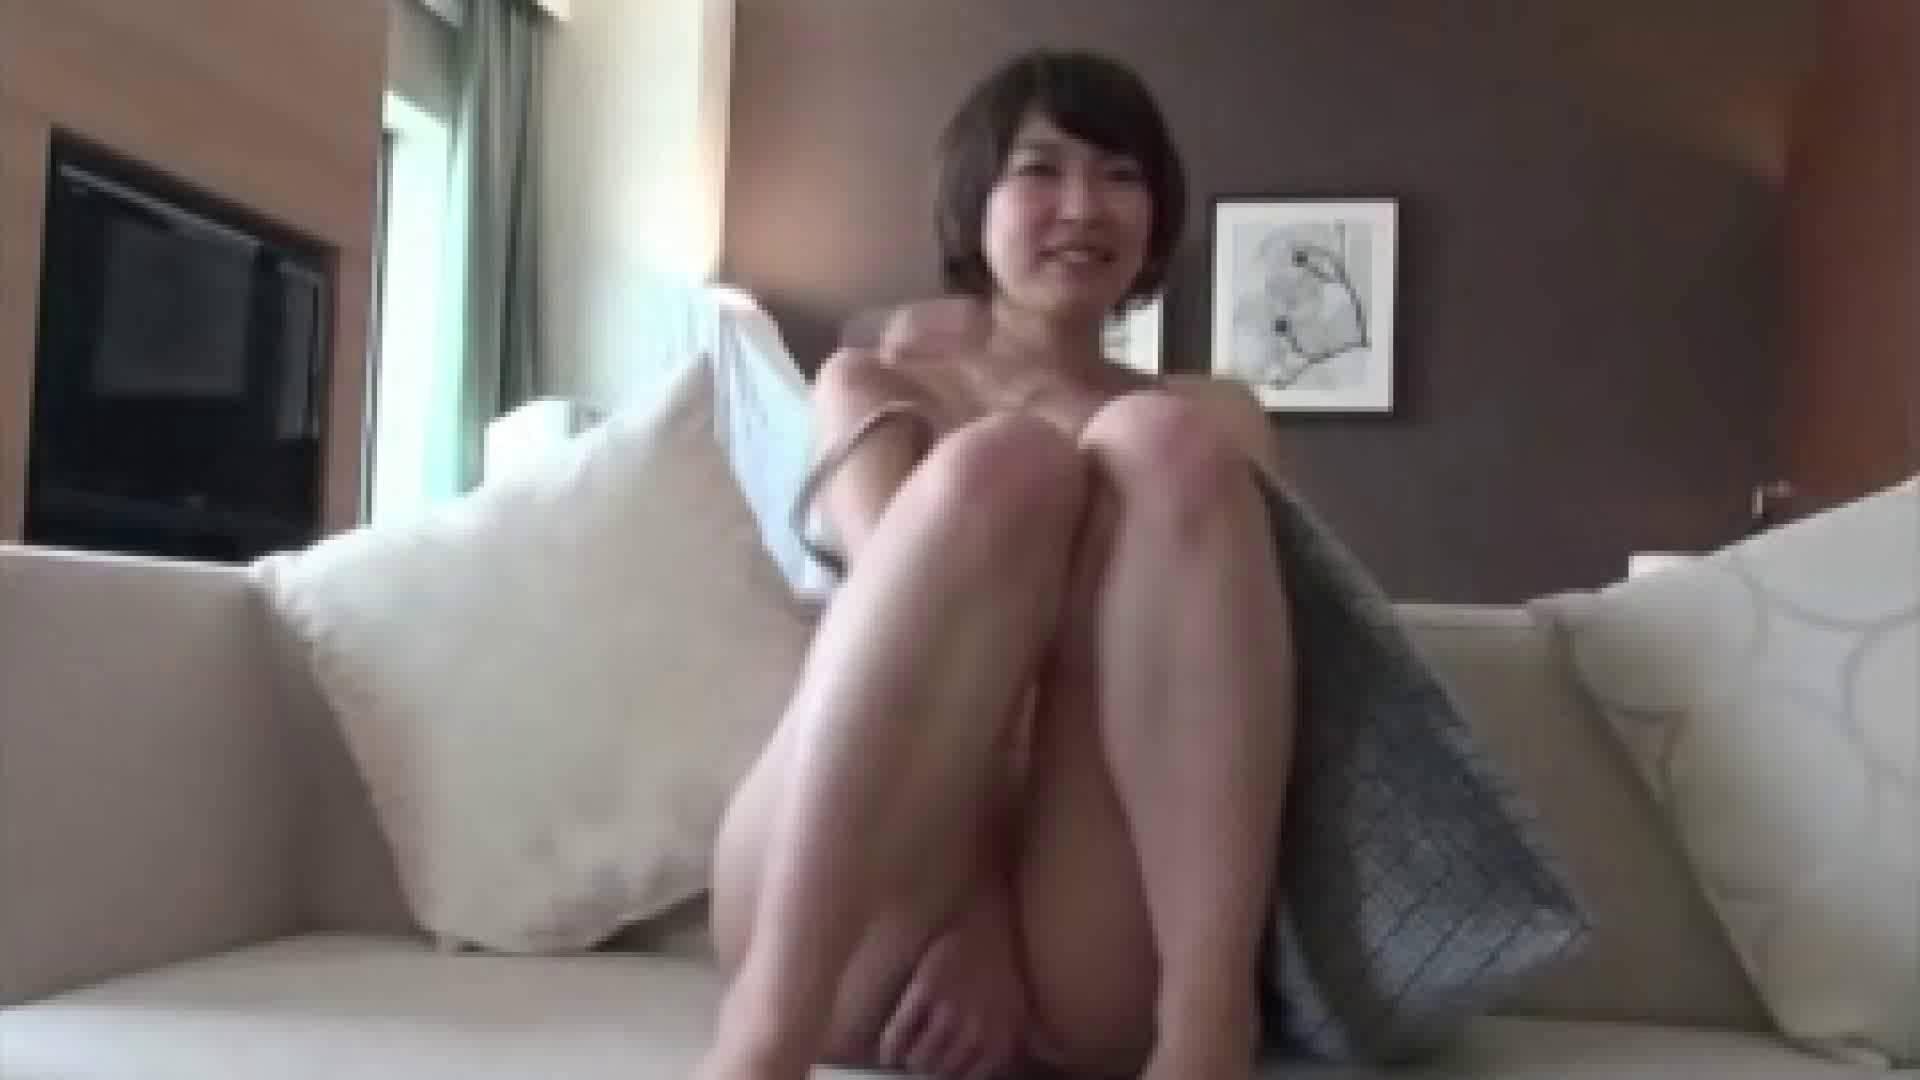 Hで可愛くてケシカラン! Vol.13 OL裸体 | 流出作品  59画像 7